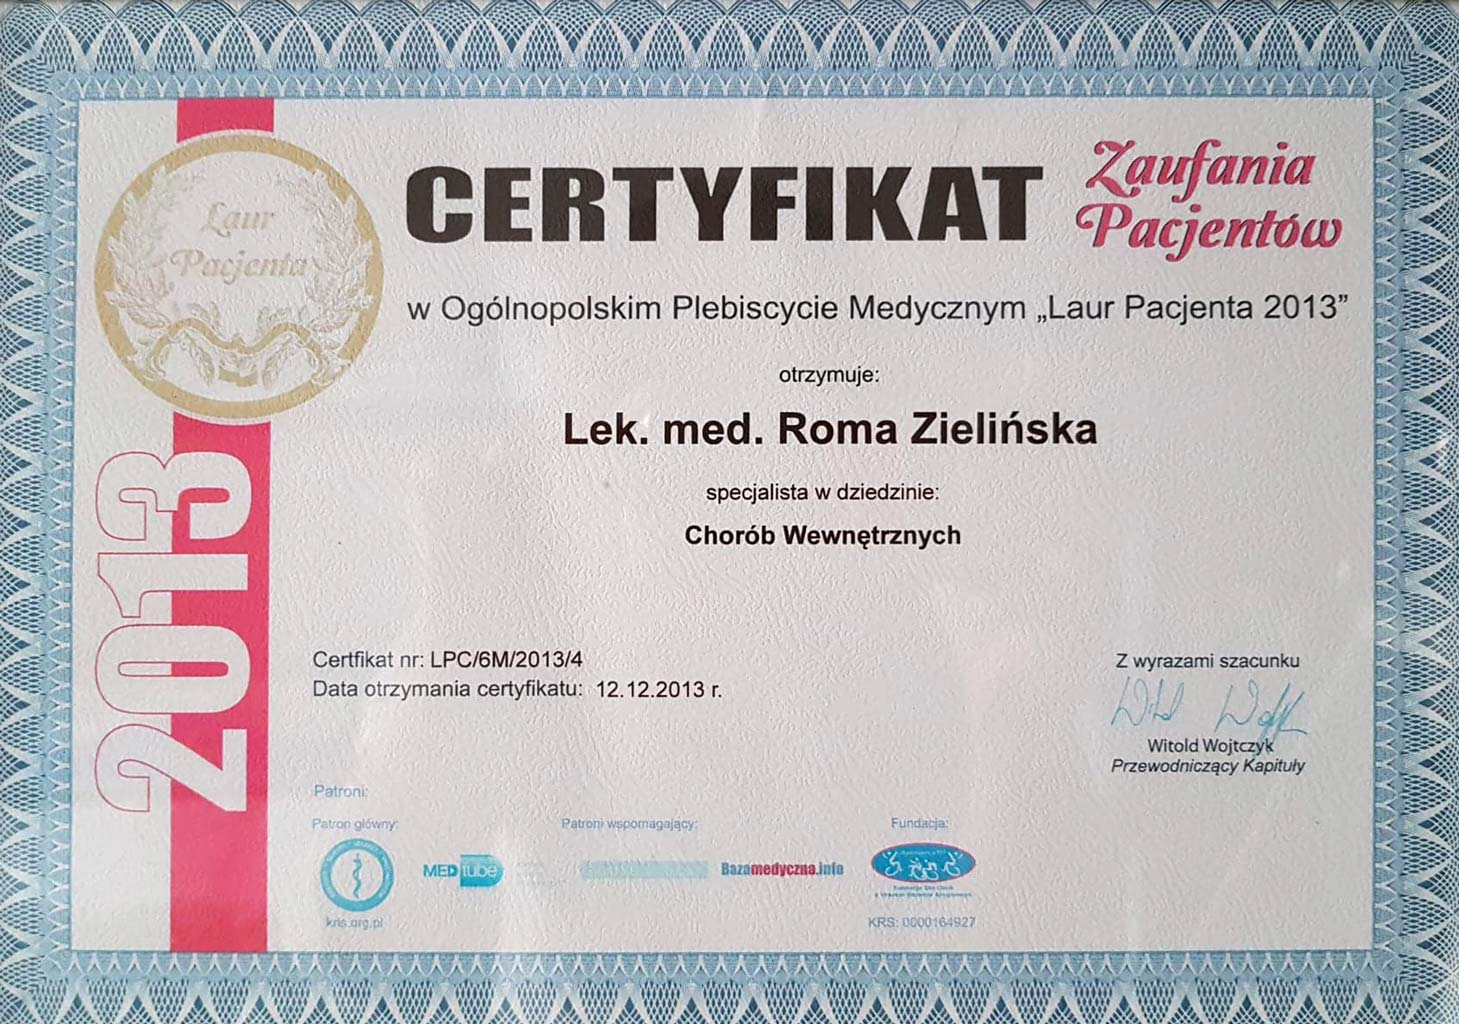 Certyfikat Laur pacjenta wklinice Magnopere wKrakowie